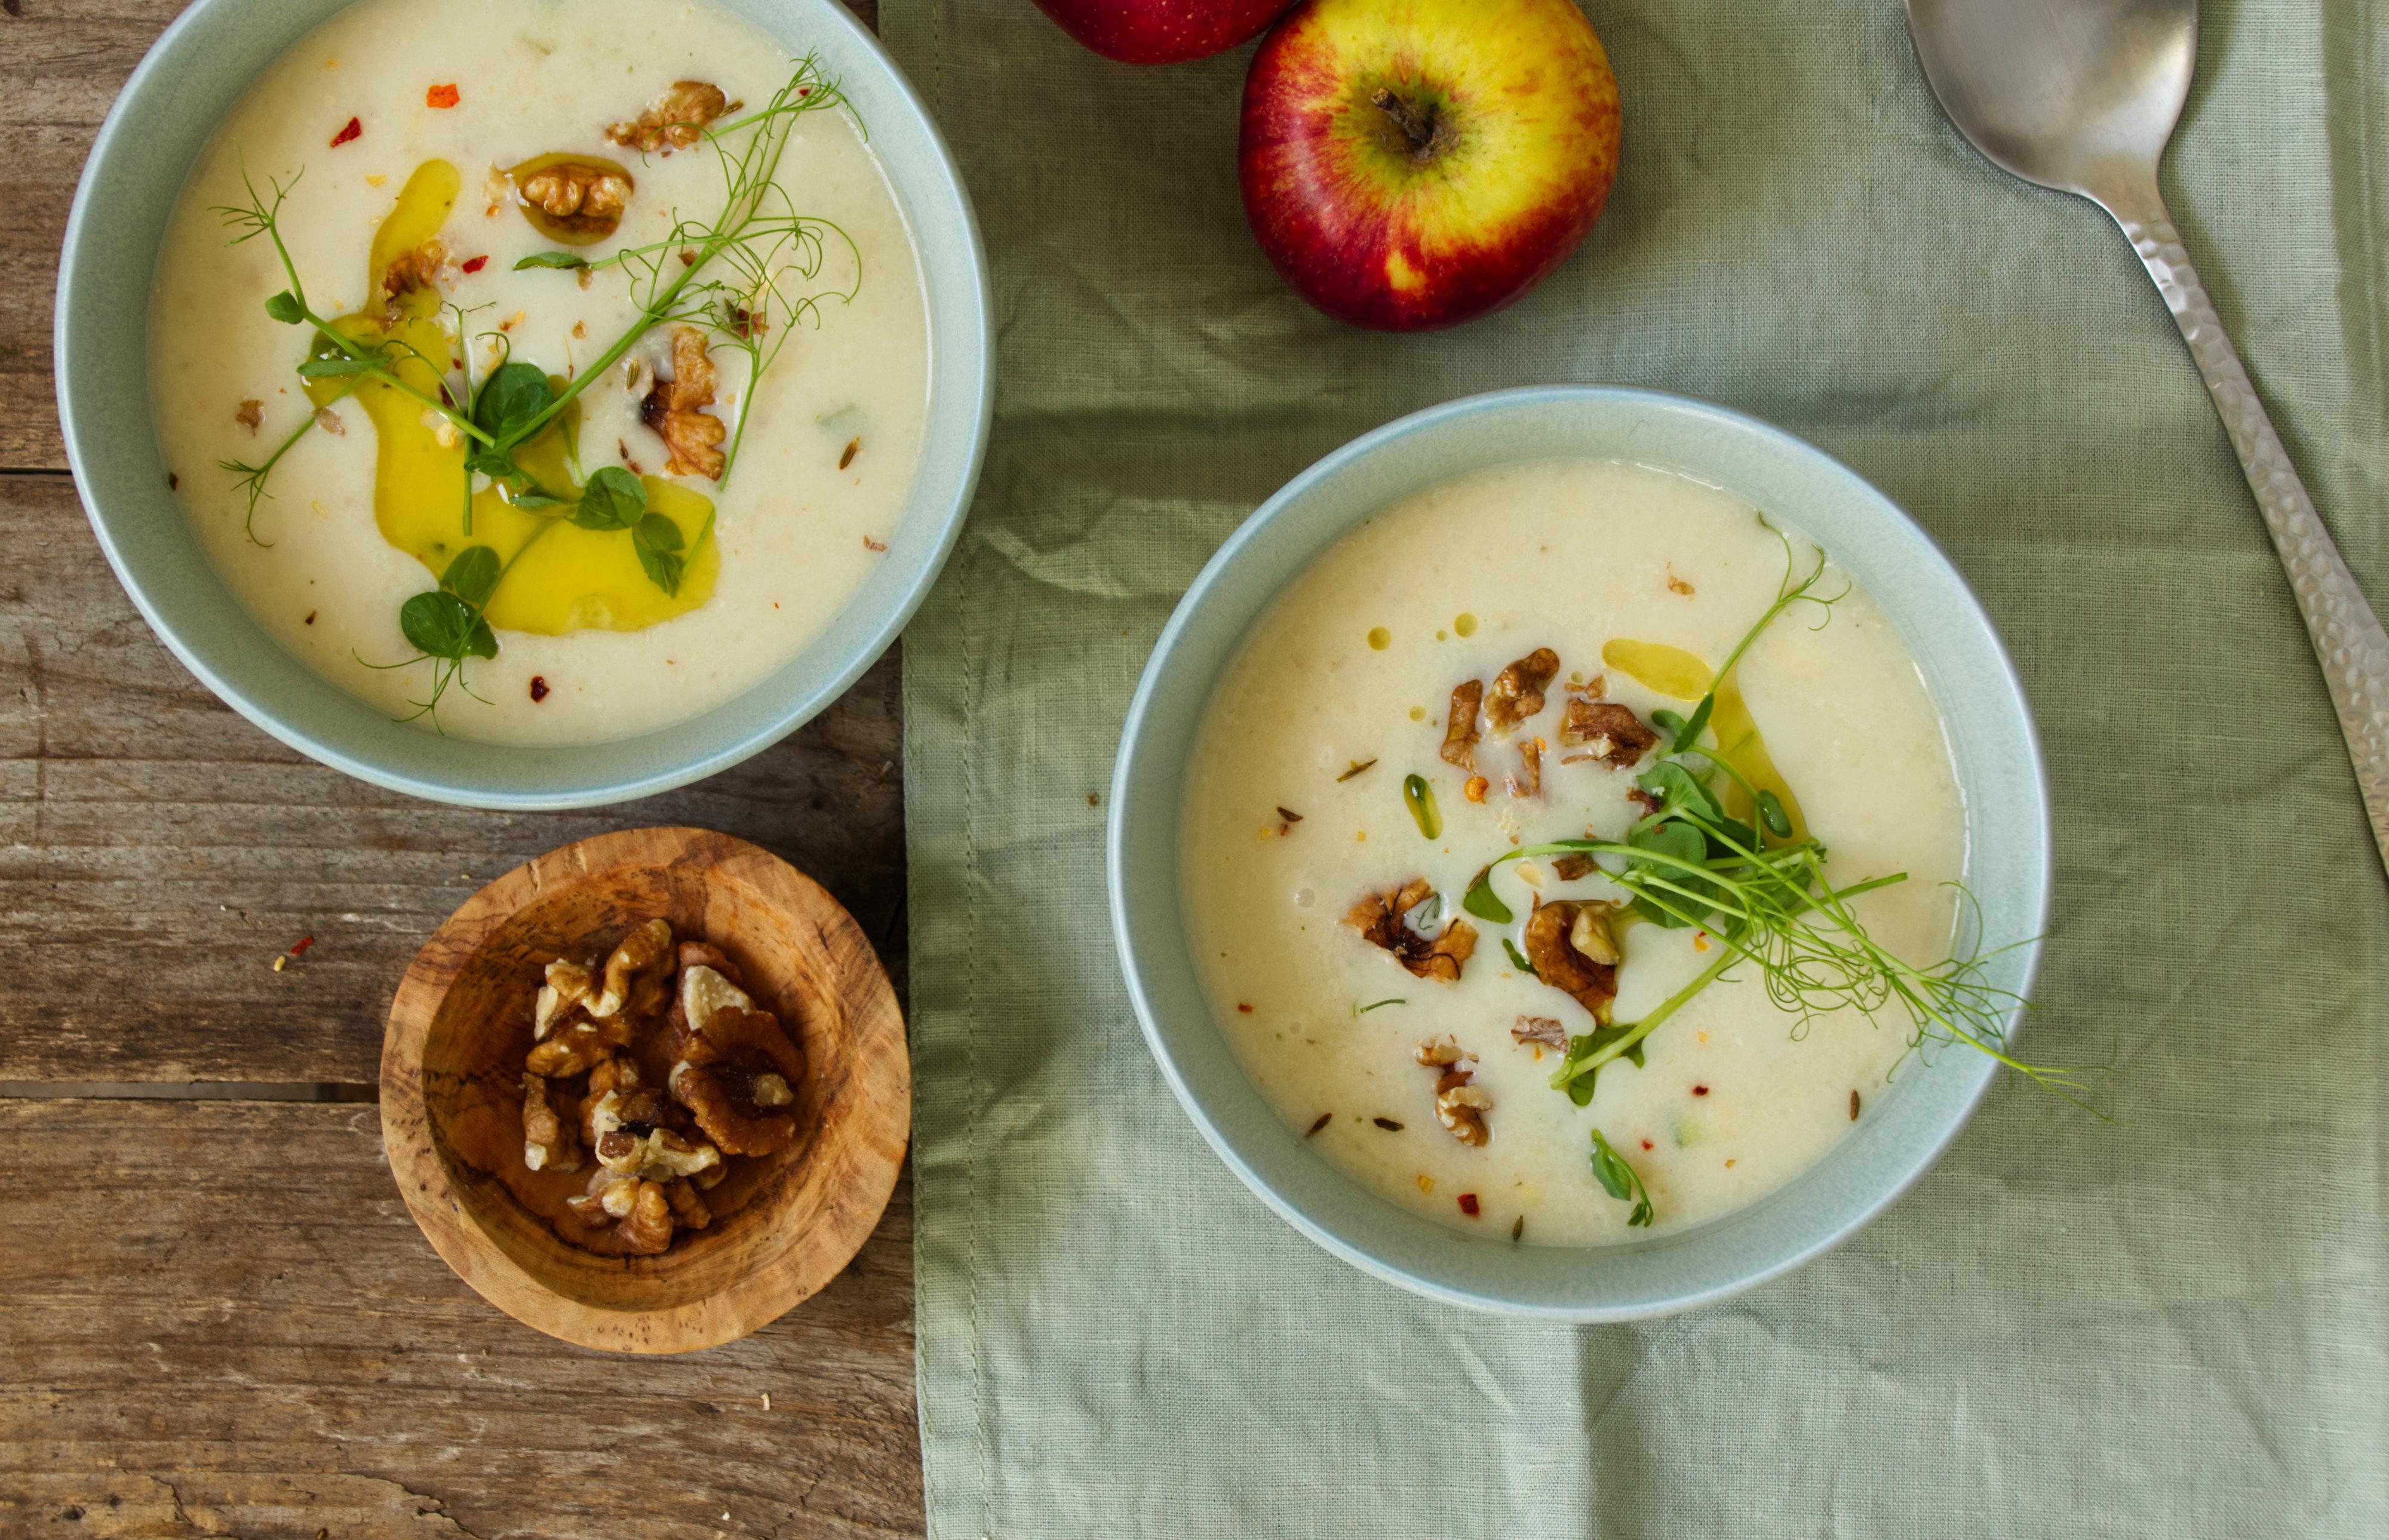 Blumenkohl-Pastinaken-Apfel-Suppe